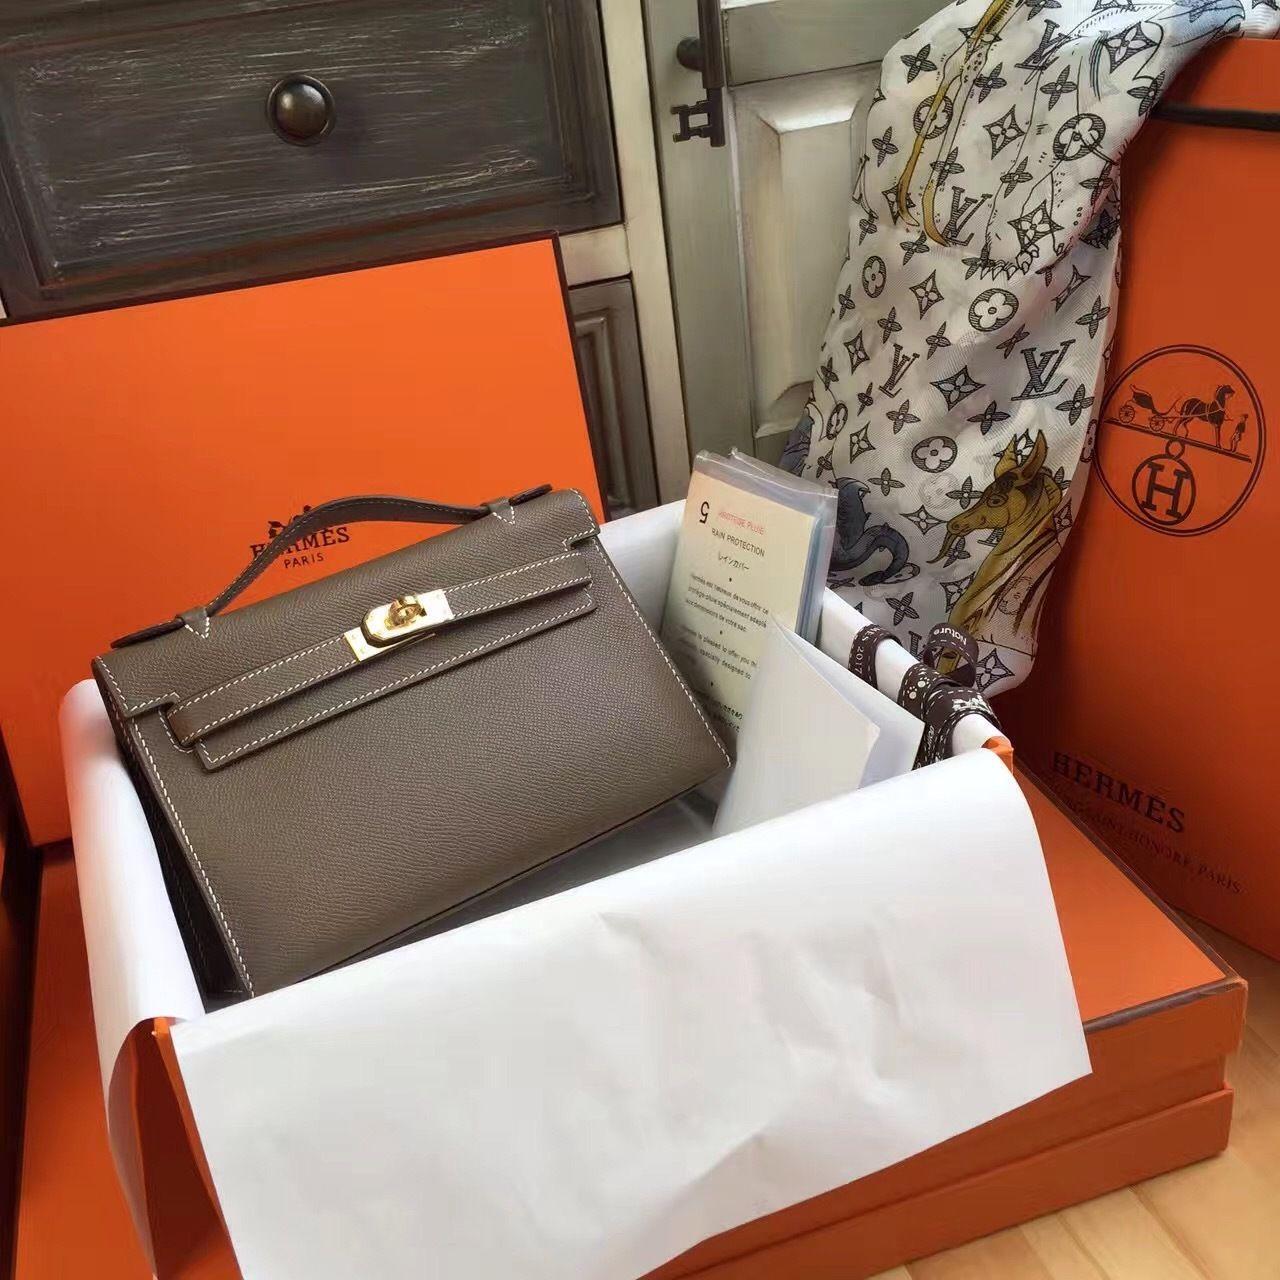 ... release date hermès 18 etoup mini kelly pochette epsom leather gold  hardware 909e7 d2589 sweden hermes lindy ... b9d374aa78